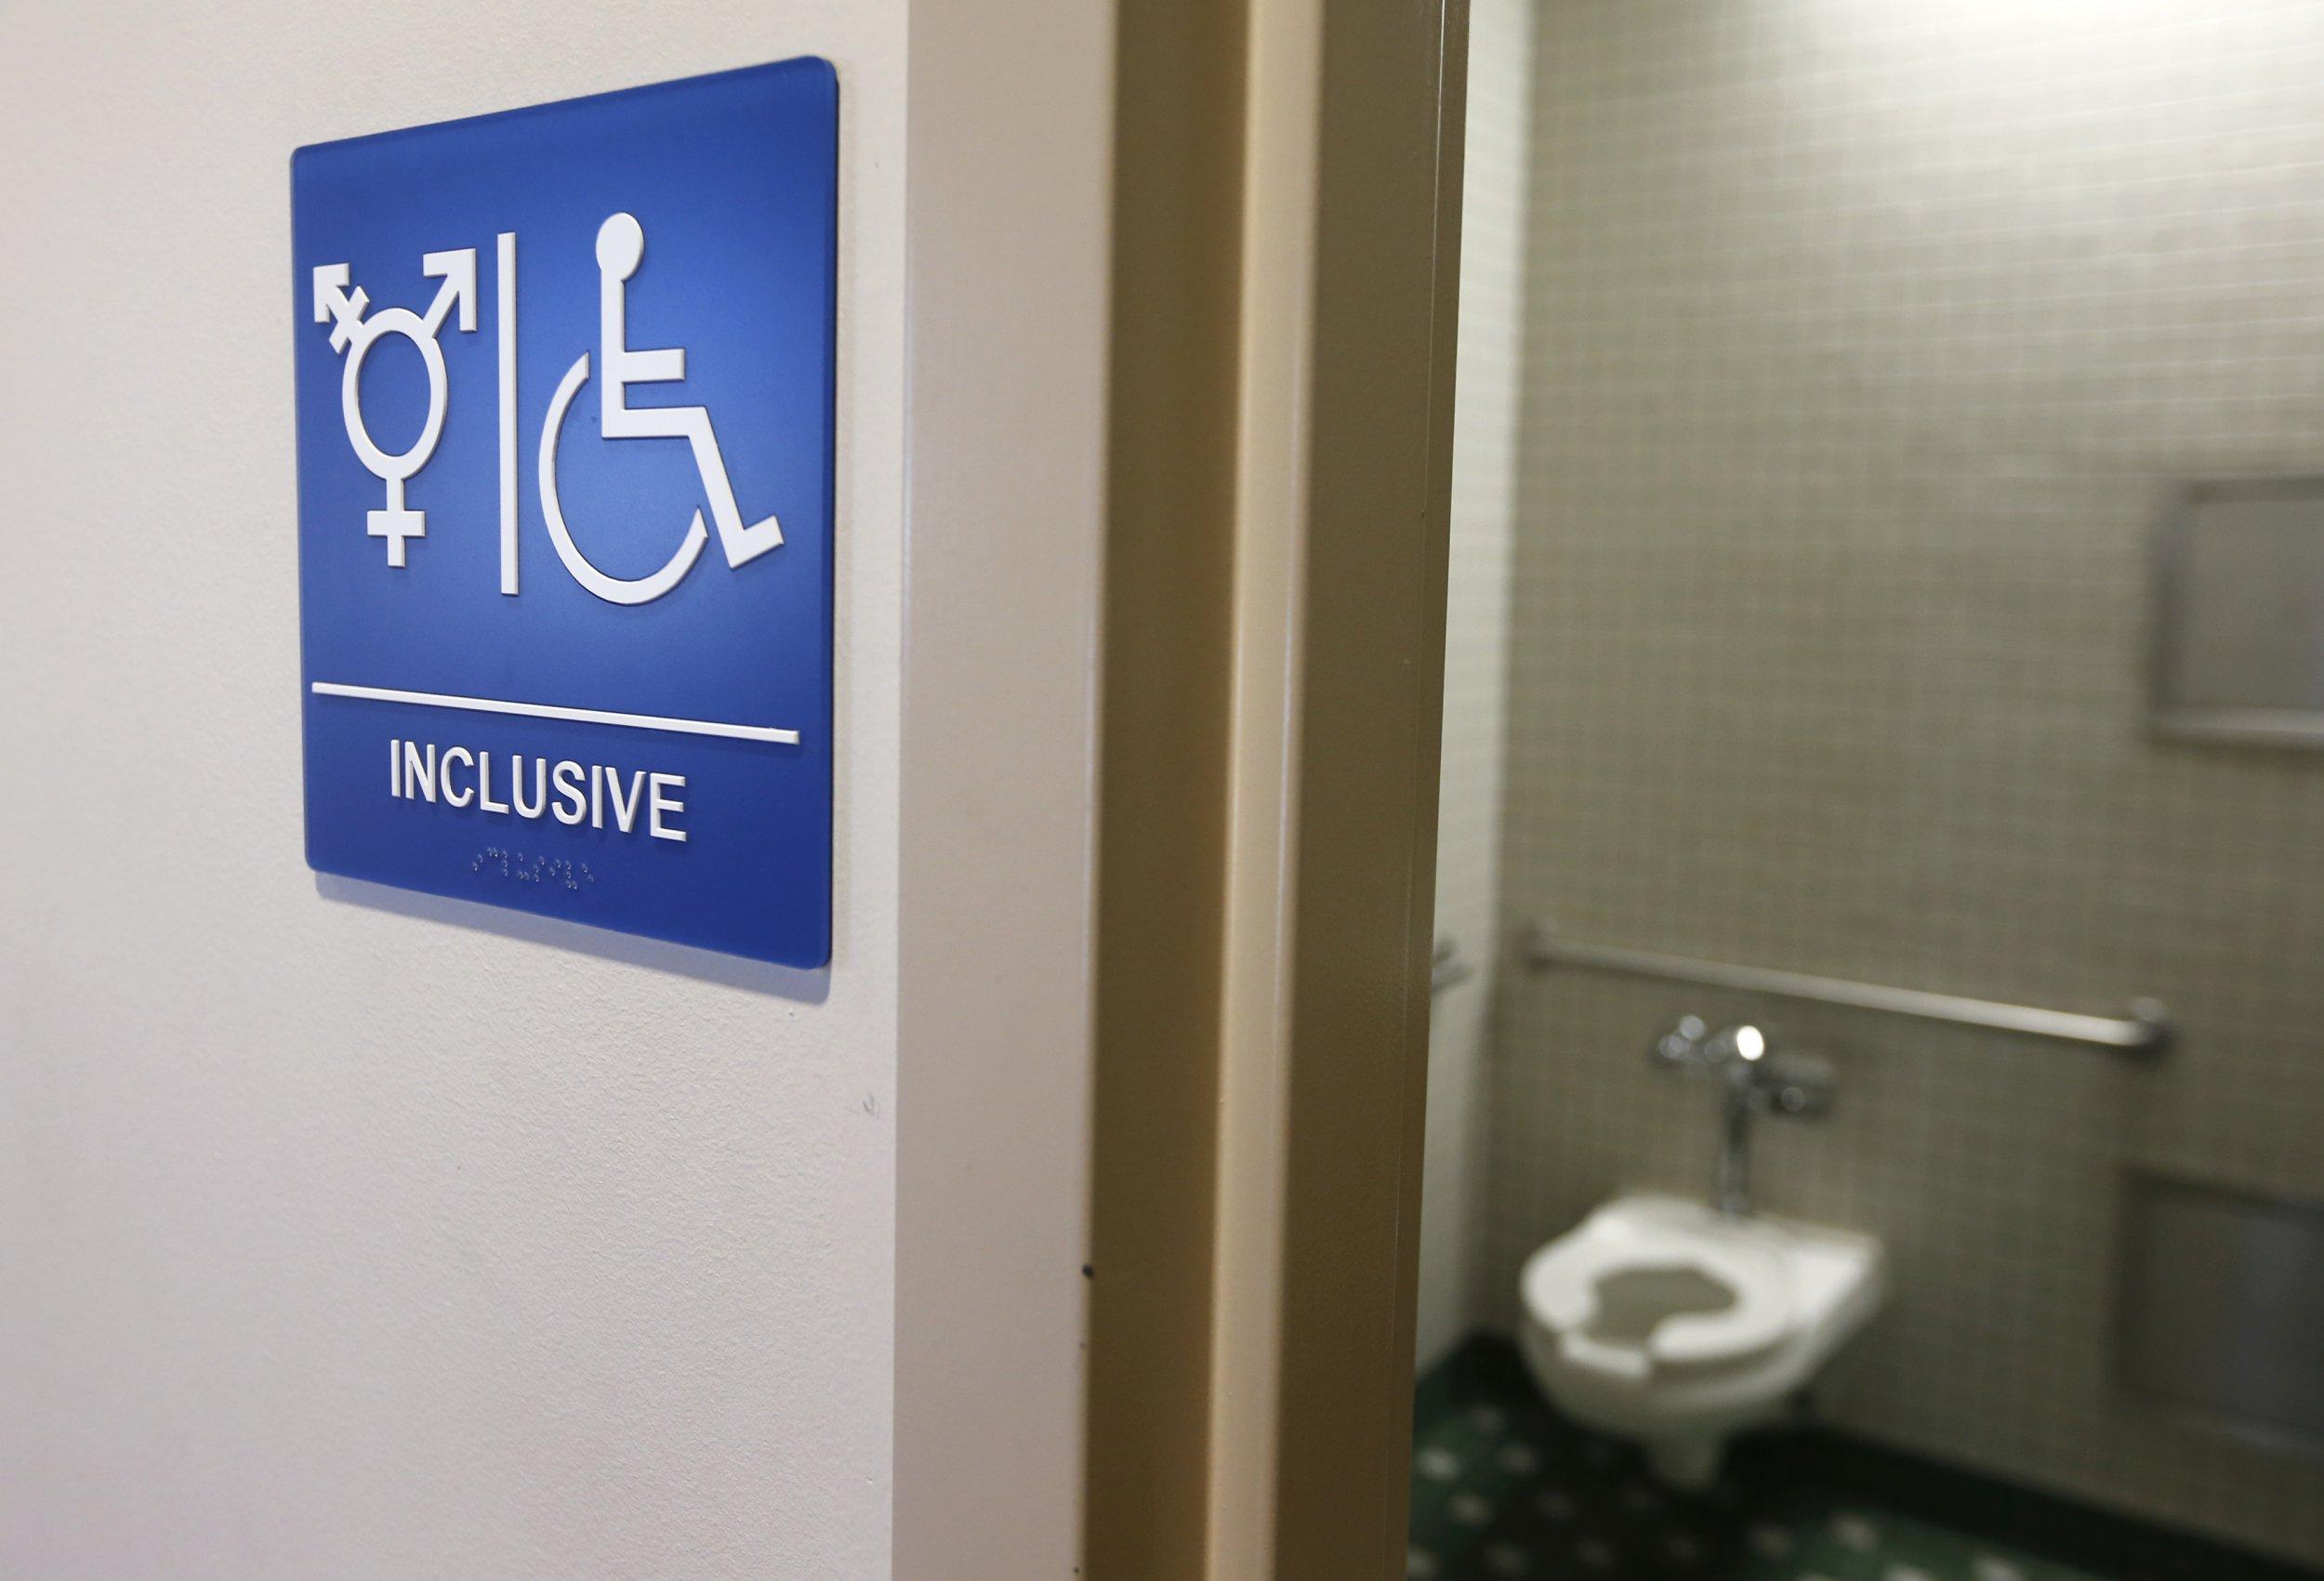 Denying Transgender People Bathroom Access Is Linked to Suicide